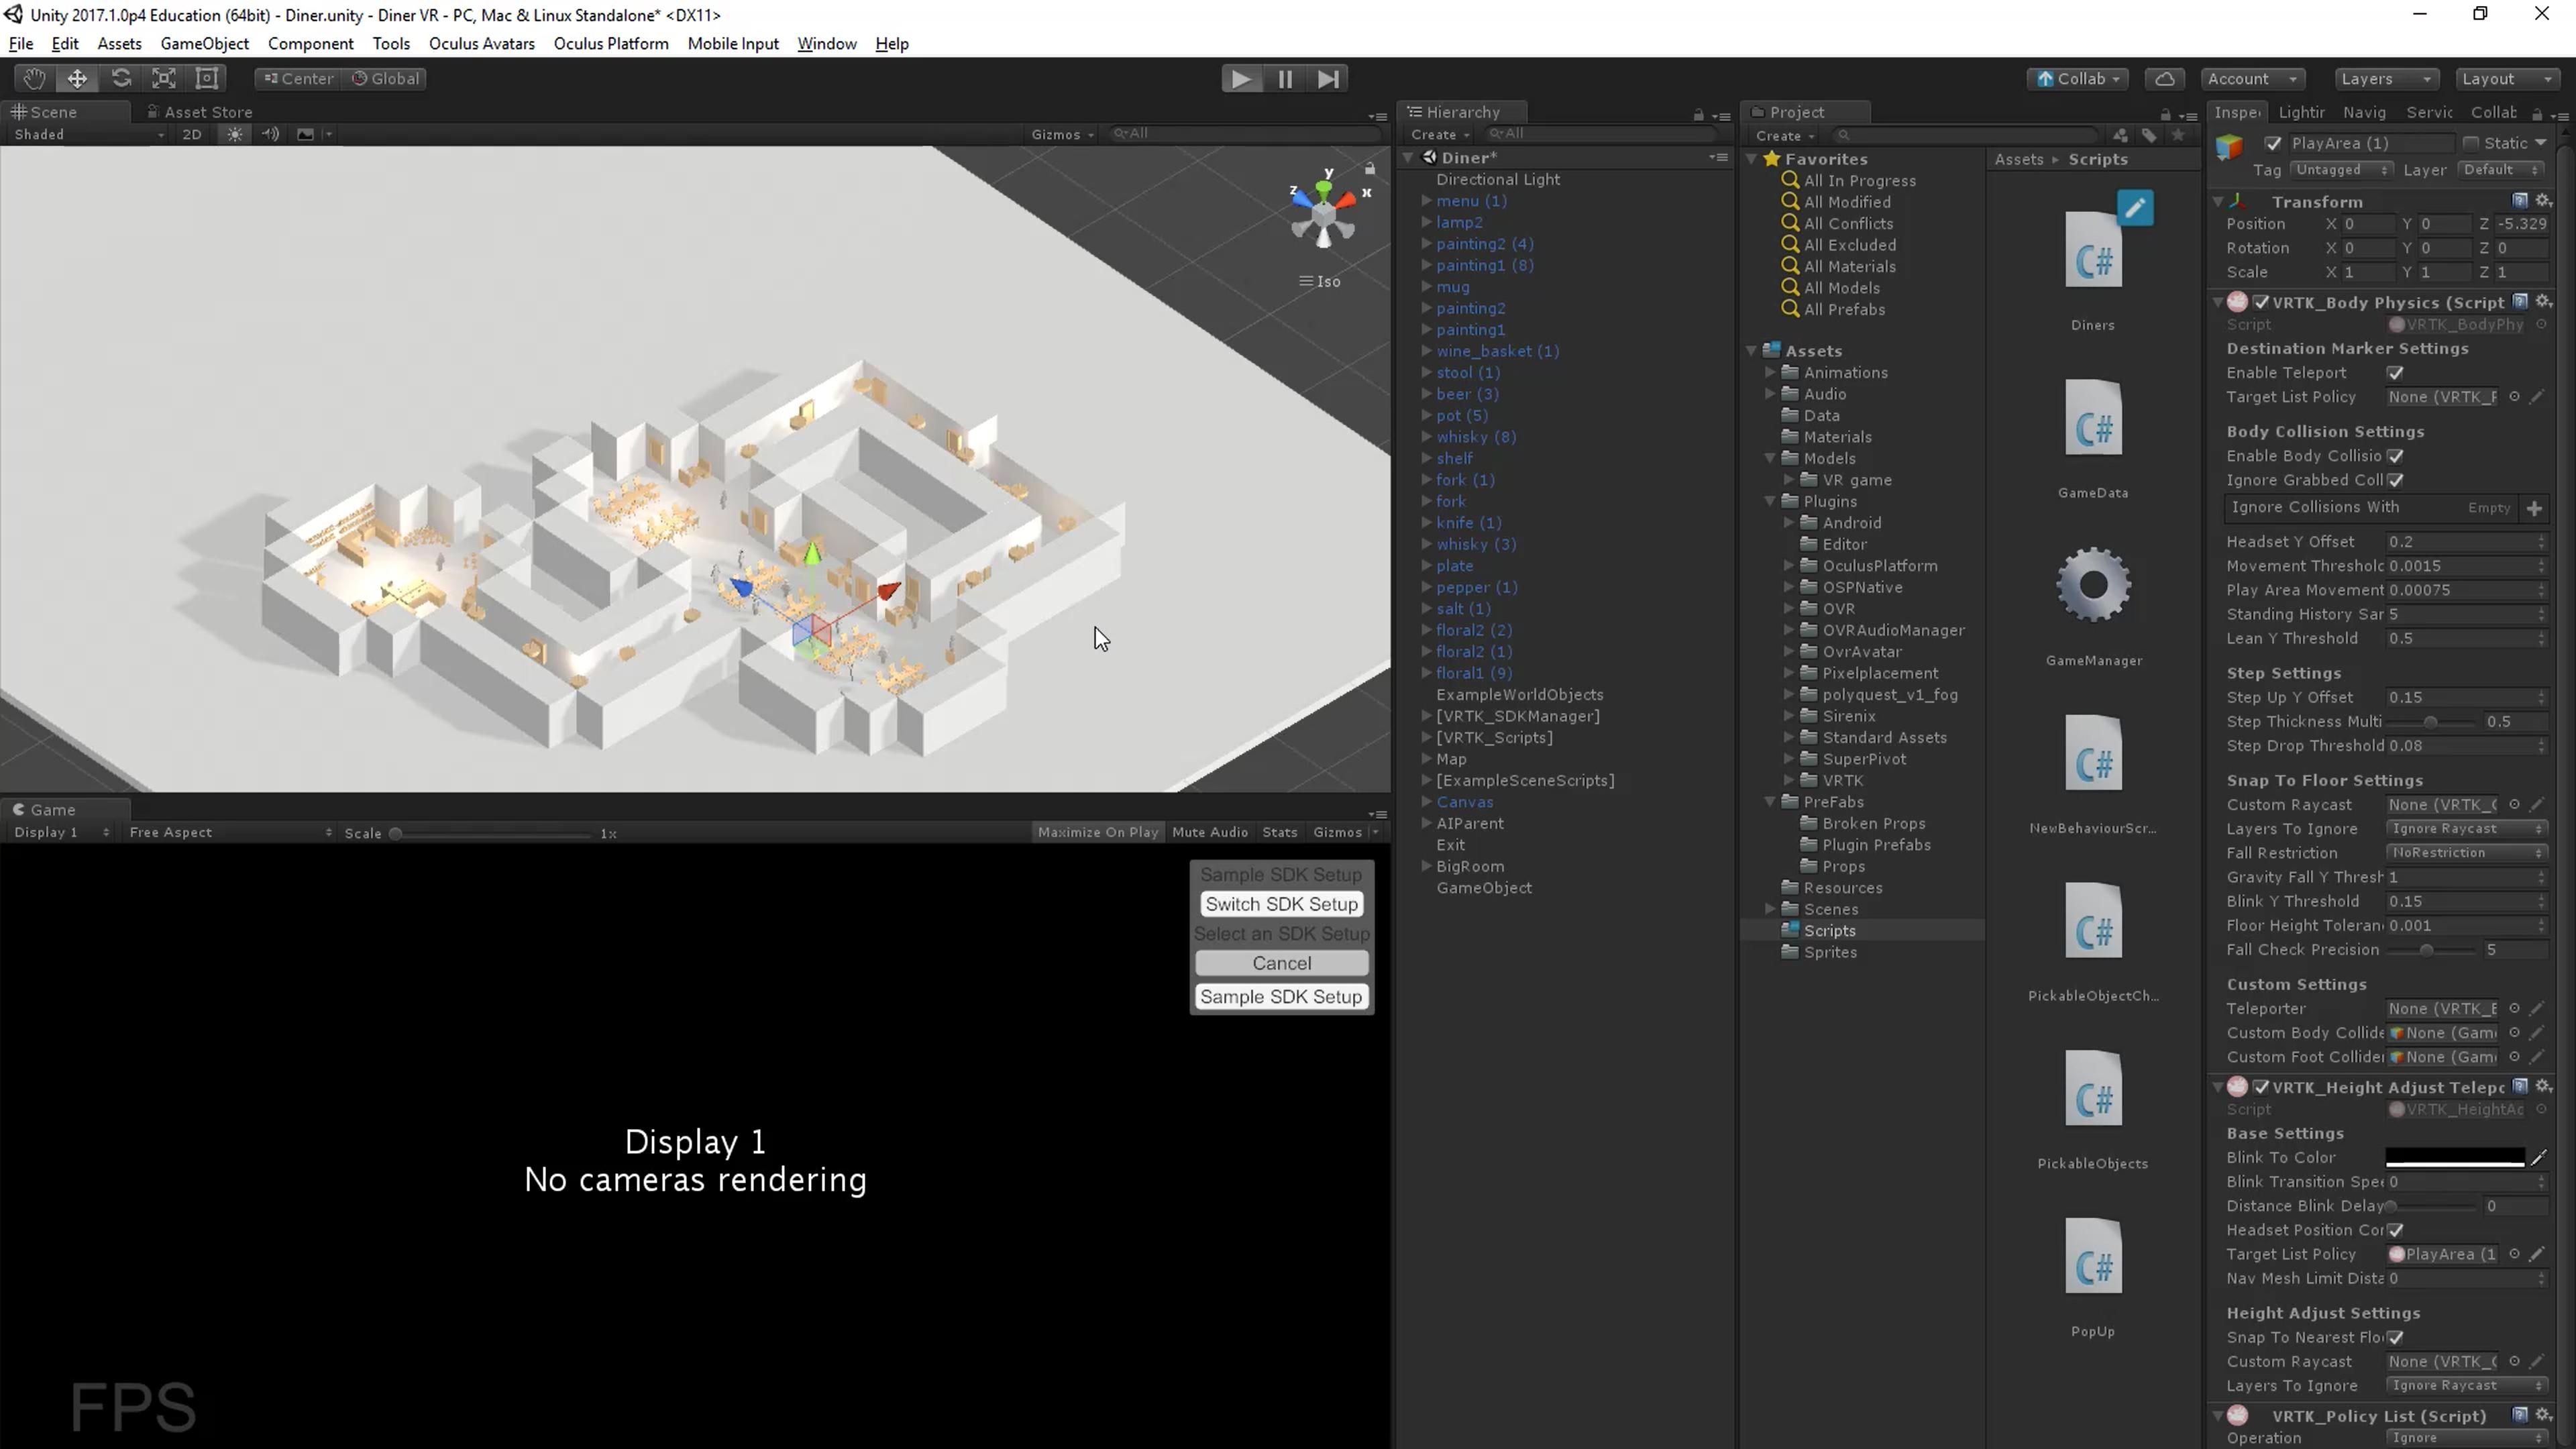 Jacob Estrella - Level Designer - Diner VR